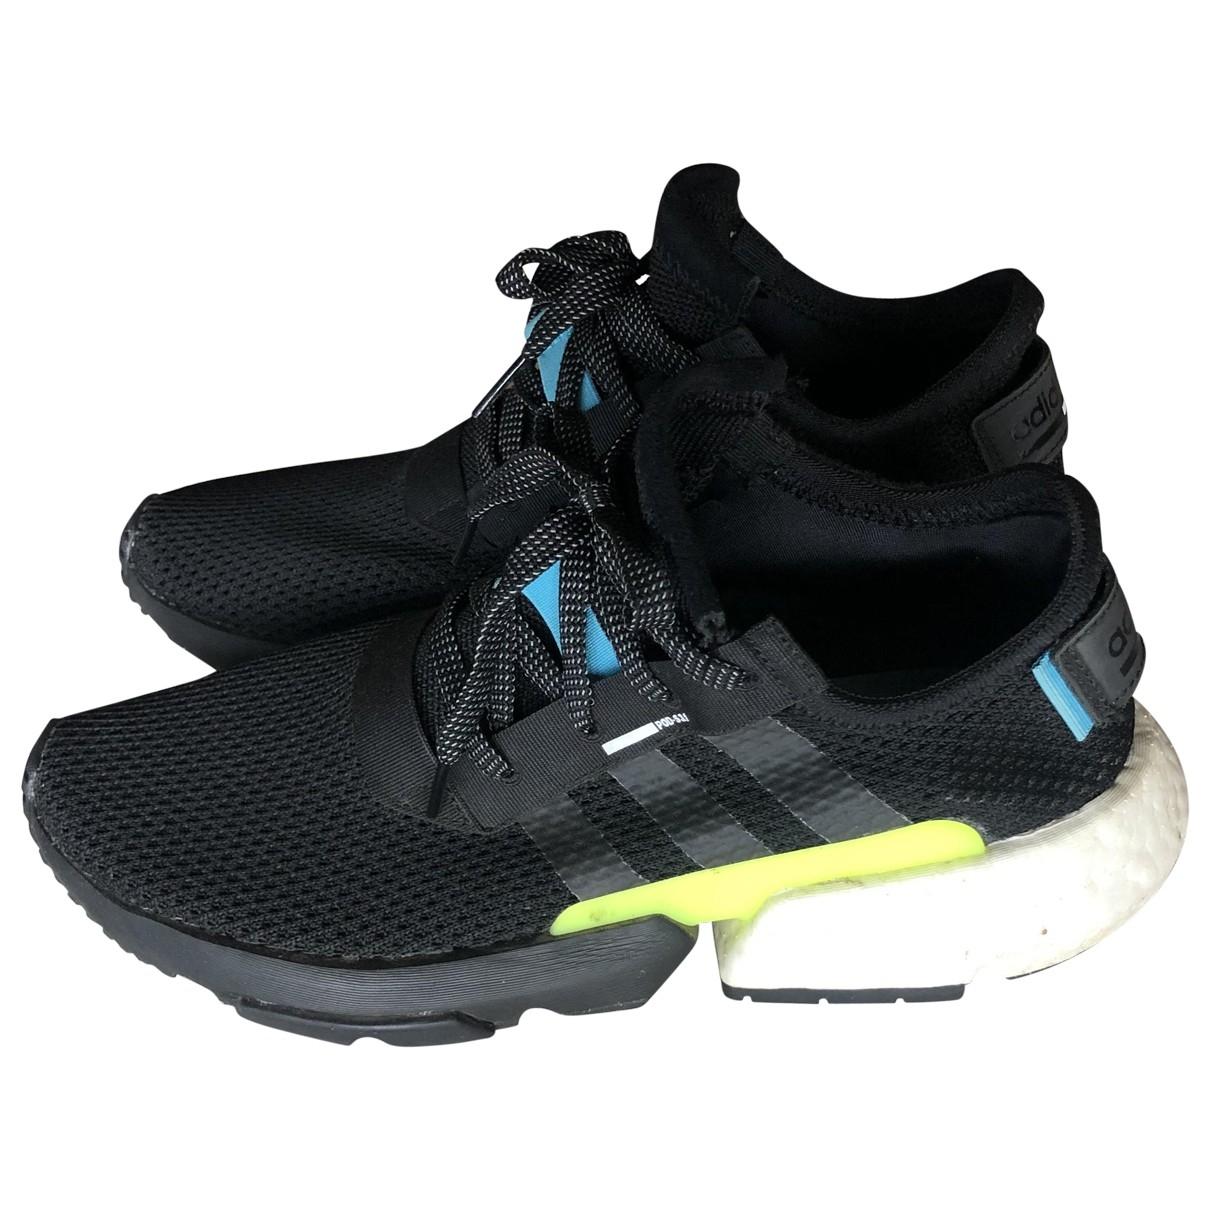 Adidas \N Black Cloth Trainers for Men 42.5 EU